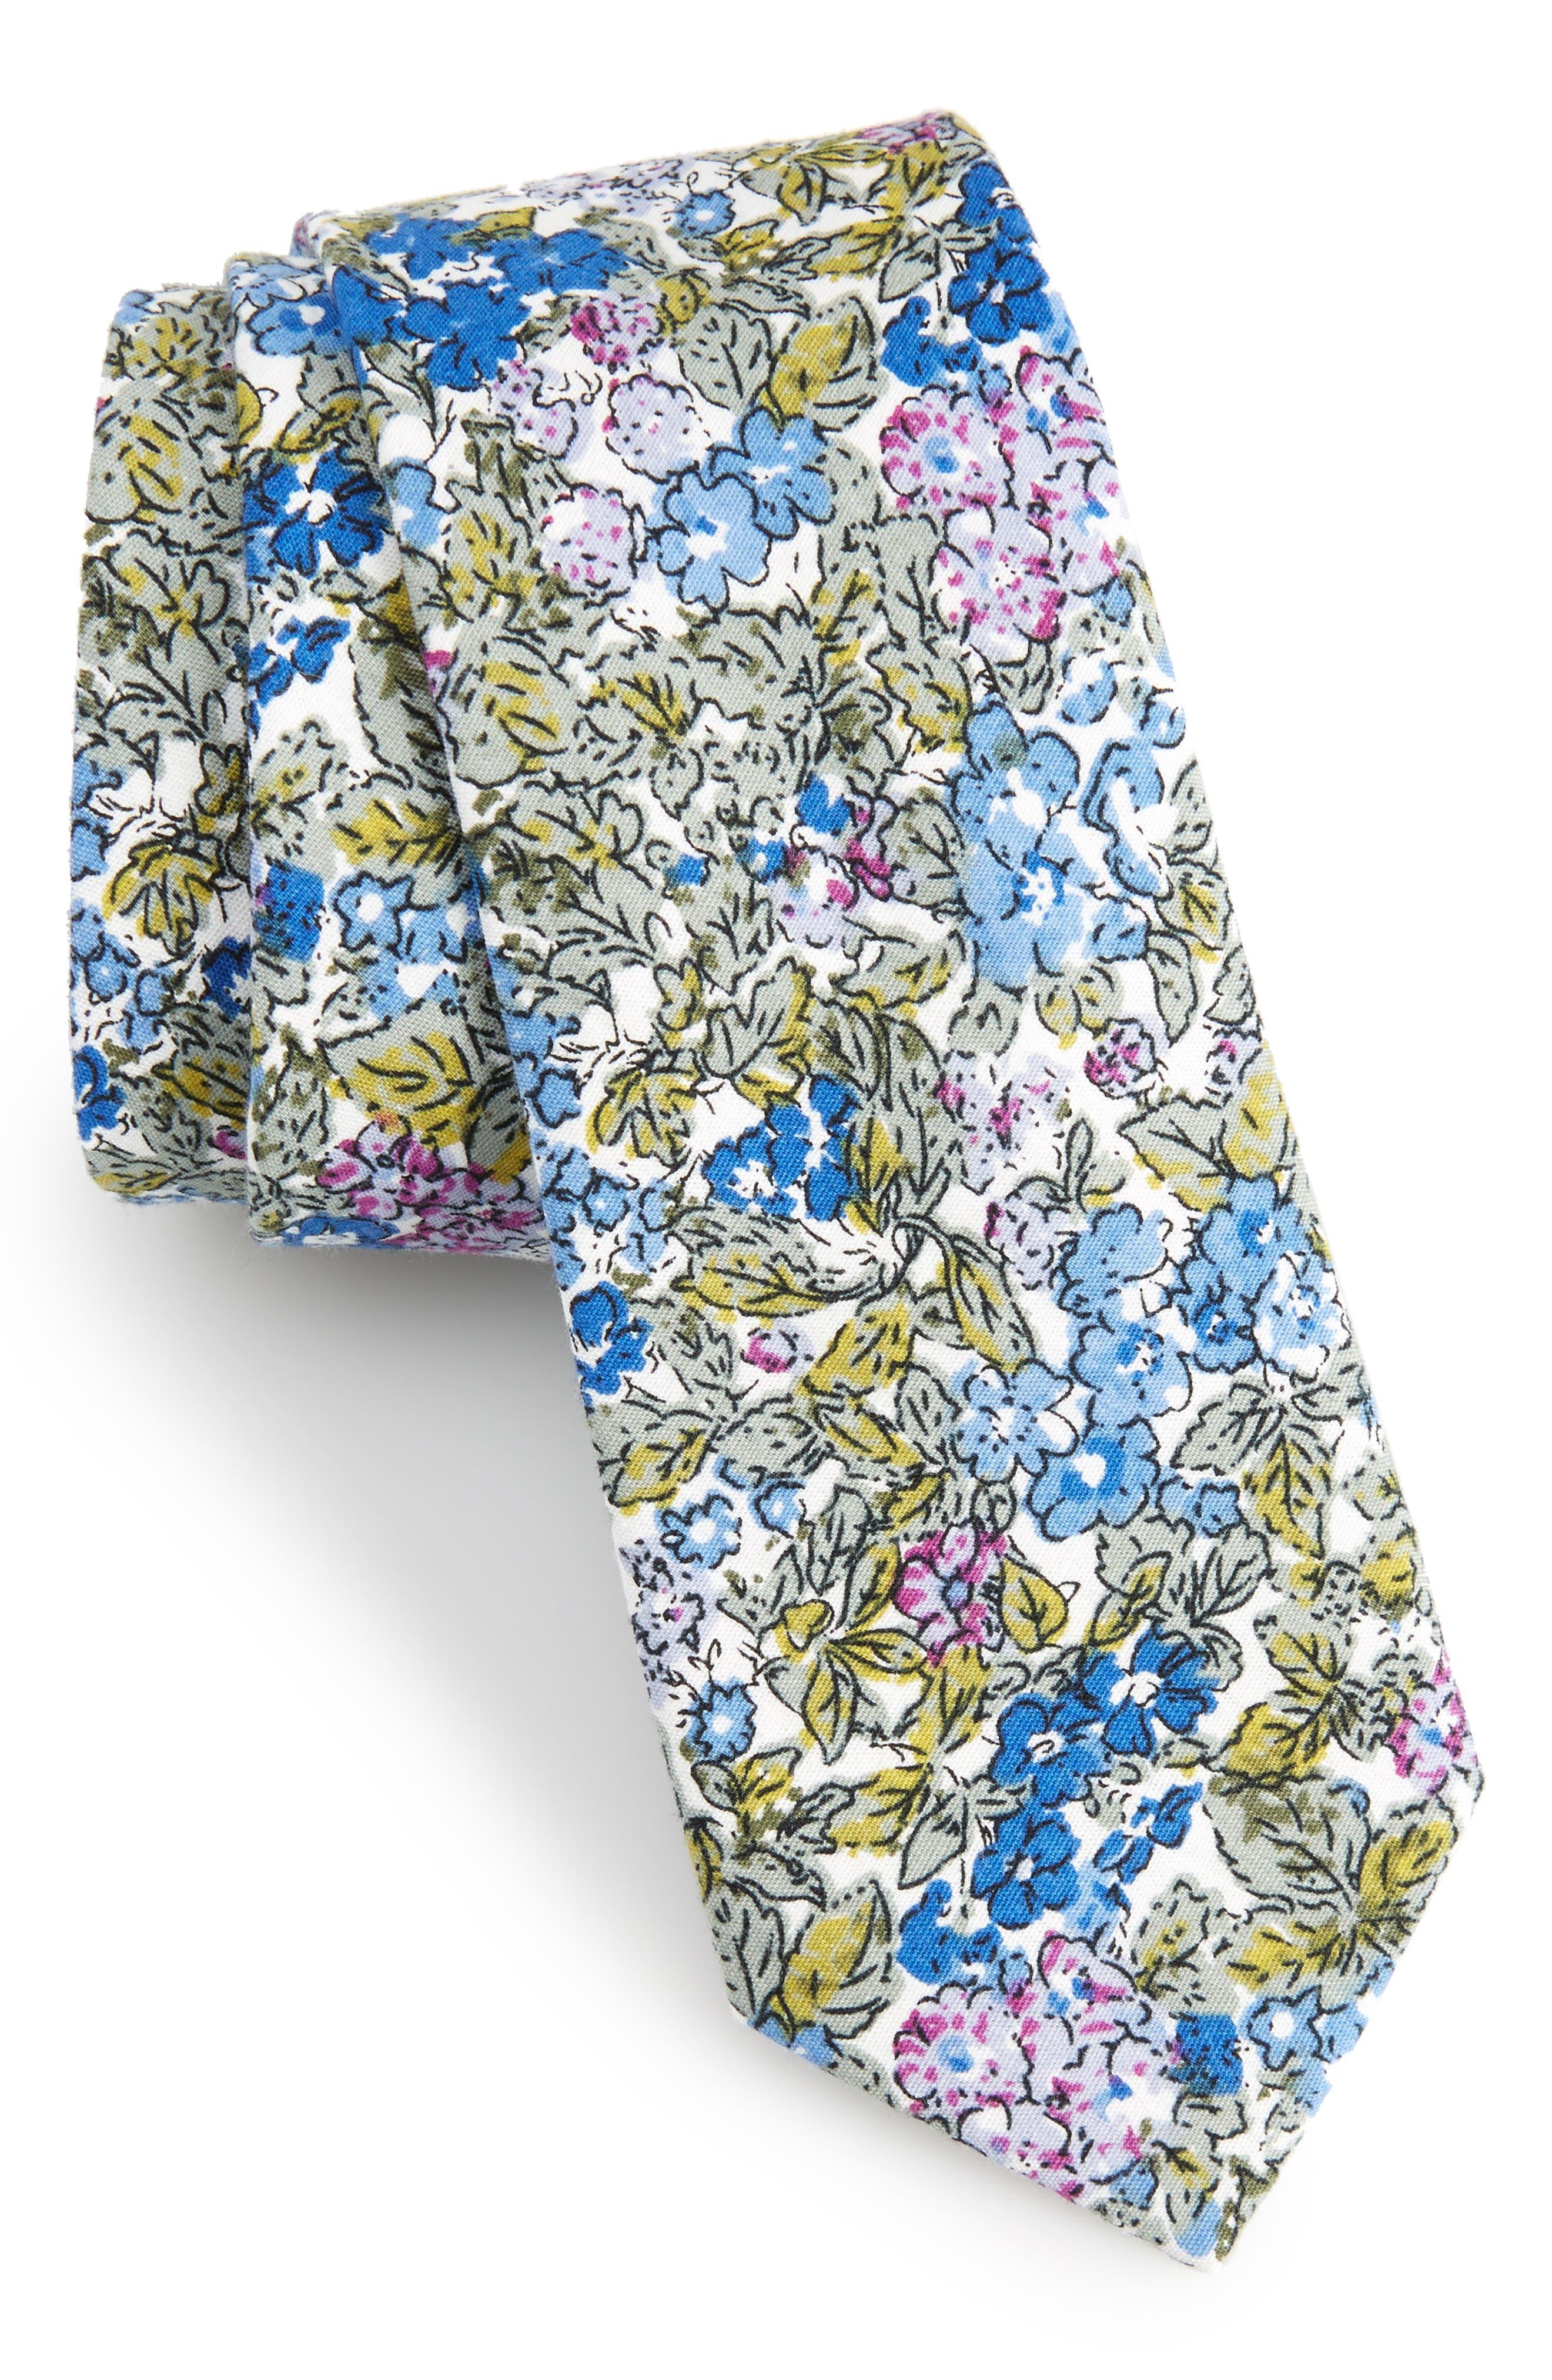 Raglan Floral Cotton Skinny Tie,                             Main thumbnail 1, color,                             400